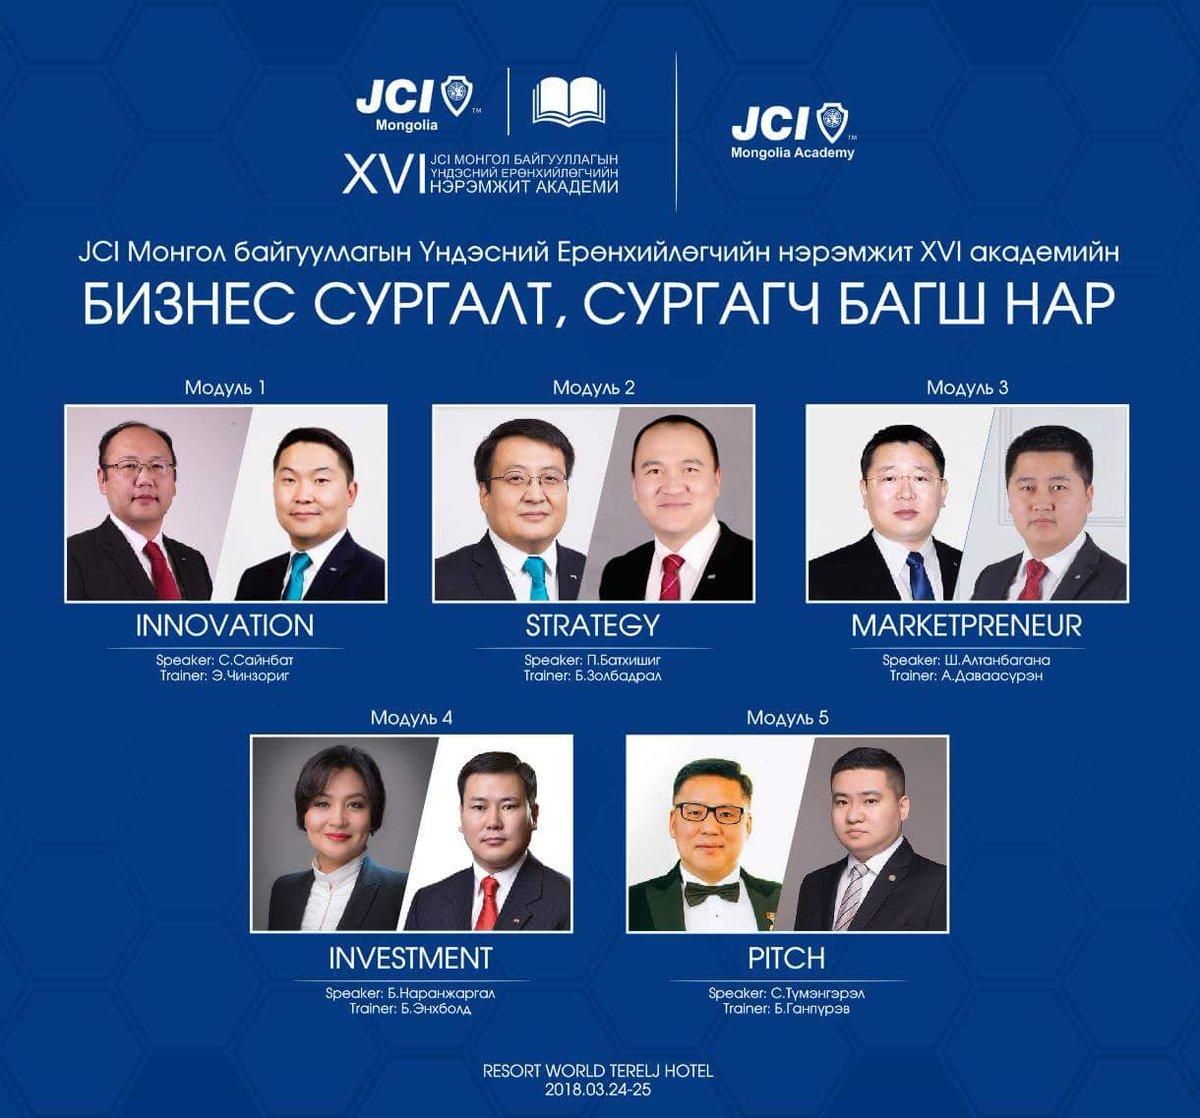 JCI Mongolia sur Twitter :